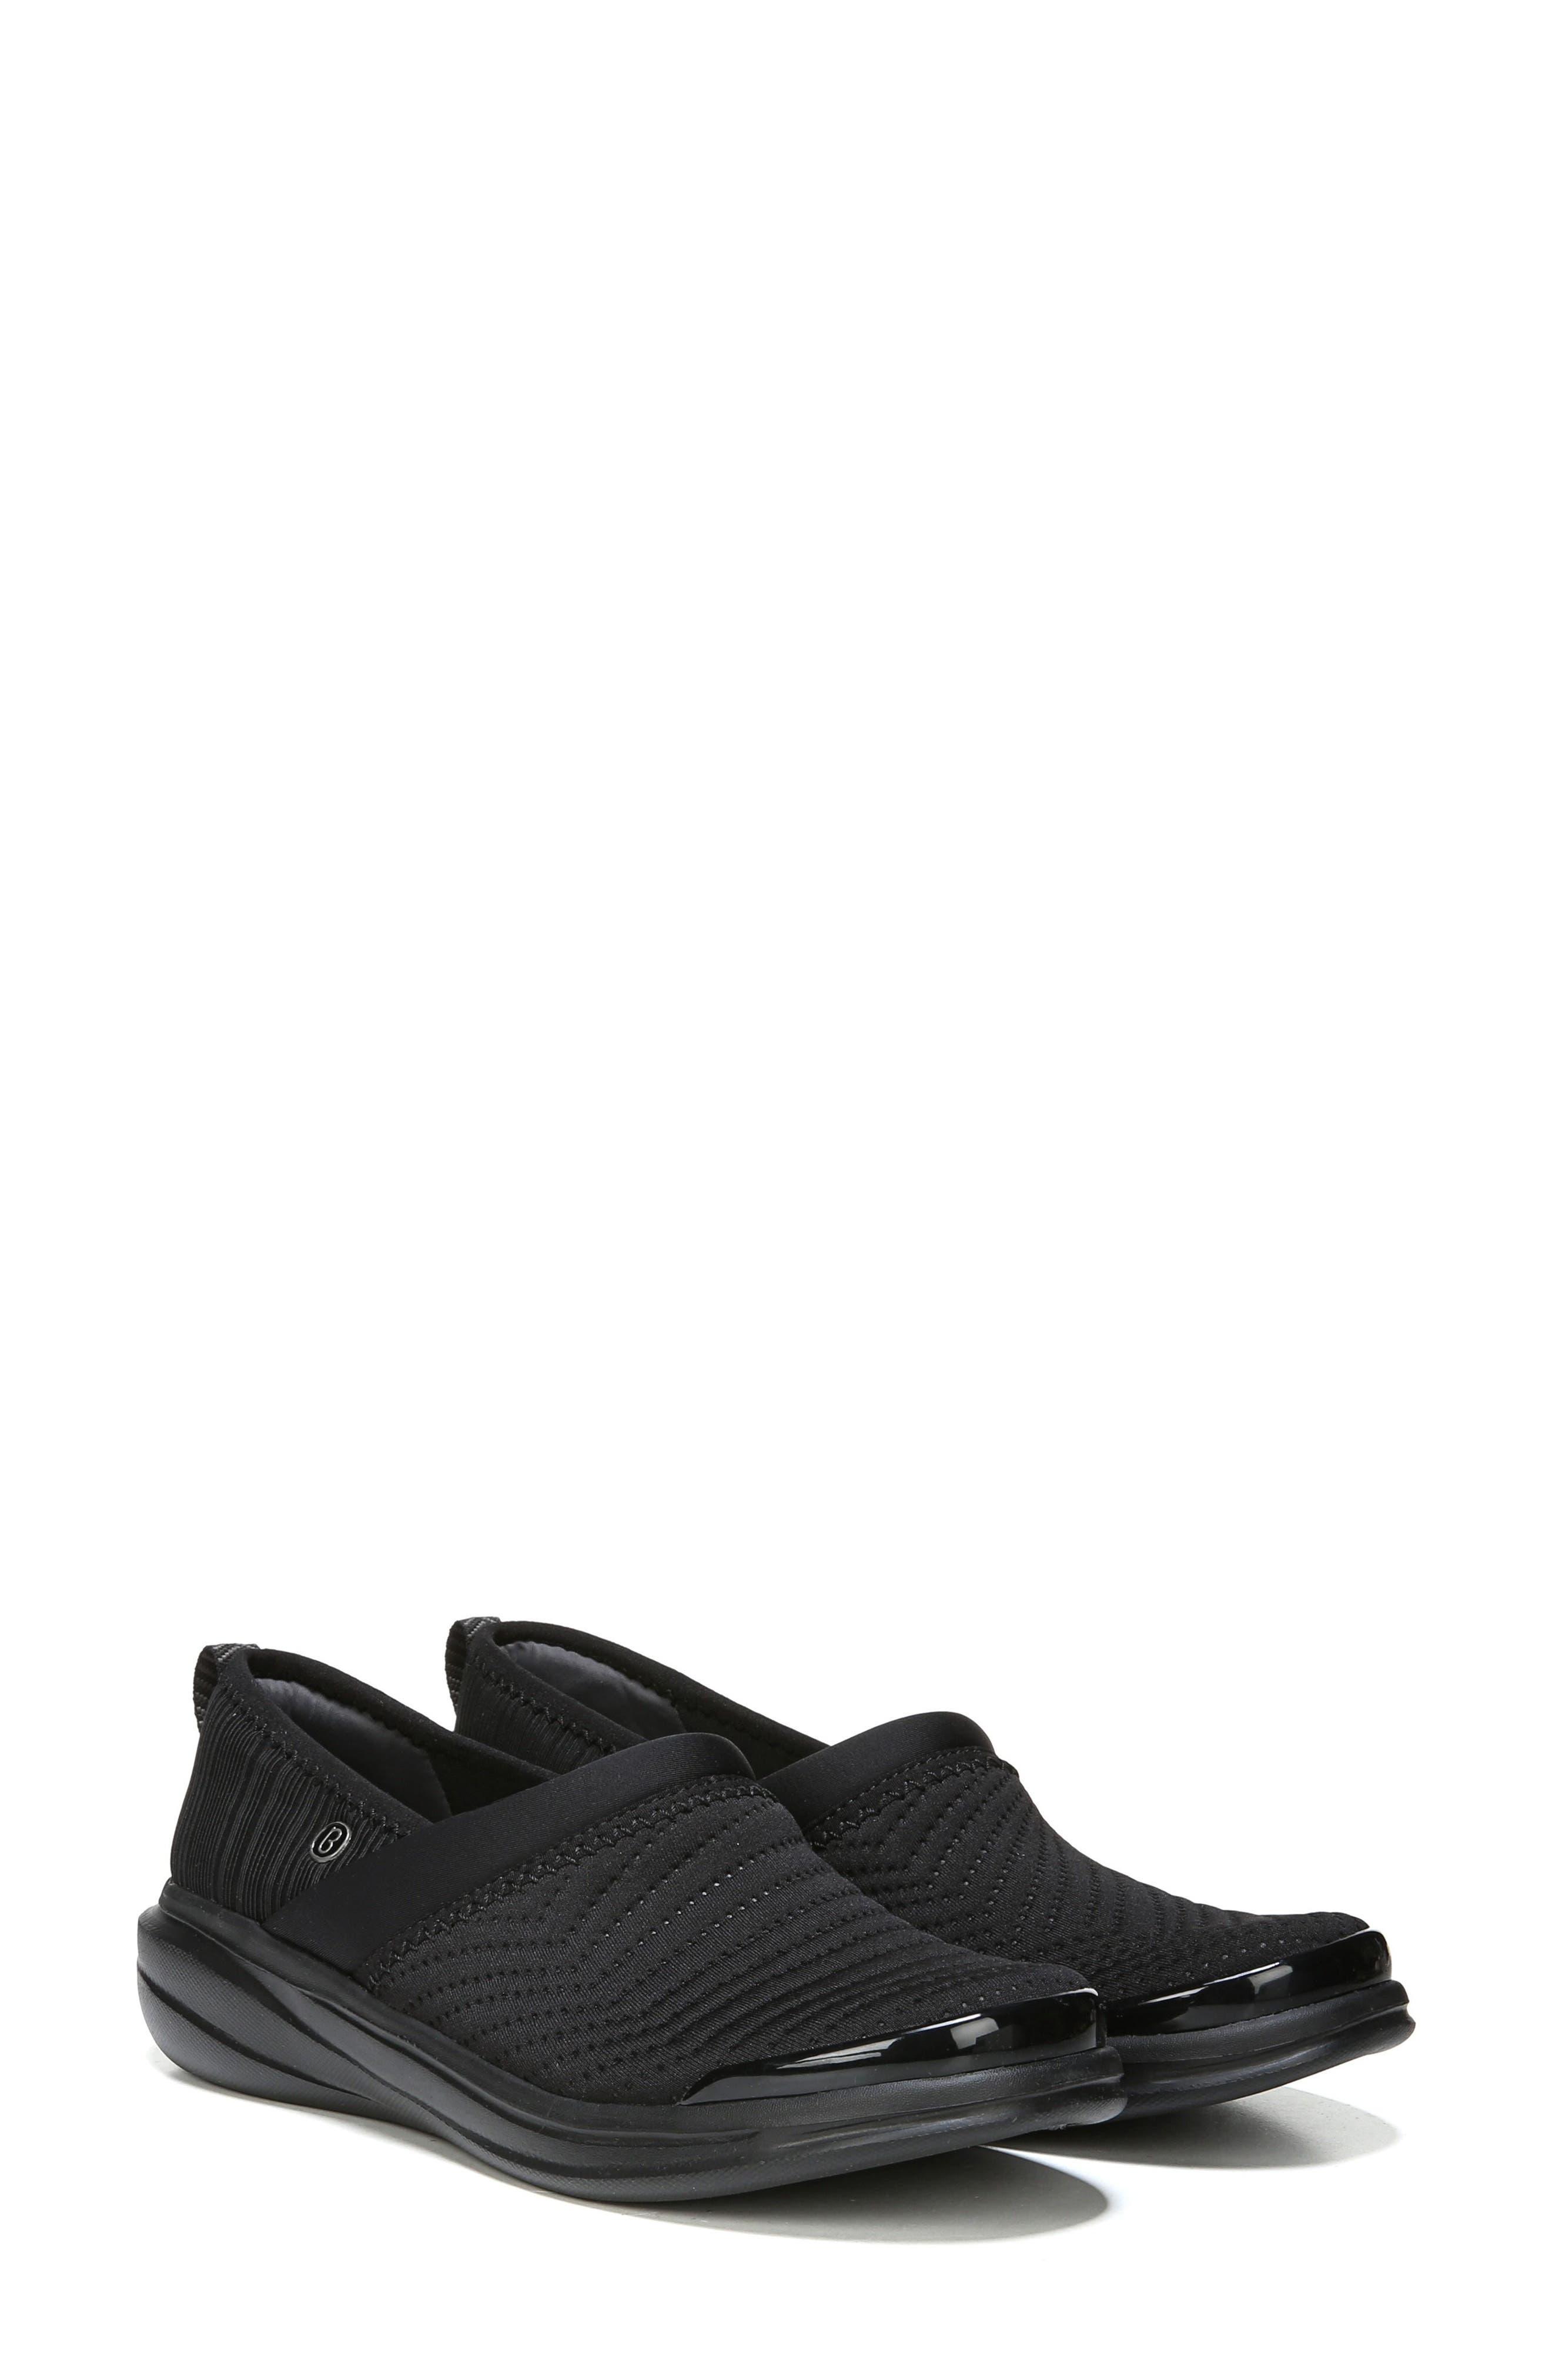 Coco Slip-On Sneaker,                             Alternate thumbnail 7, color,                             BLACK FABRIC